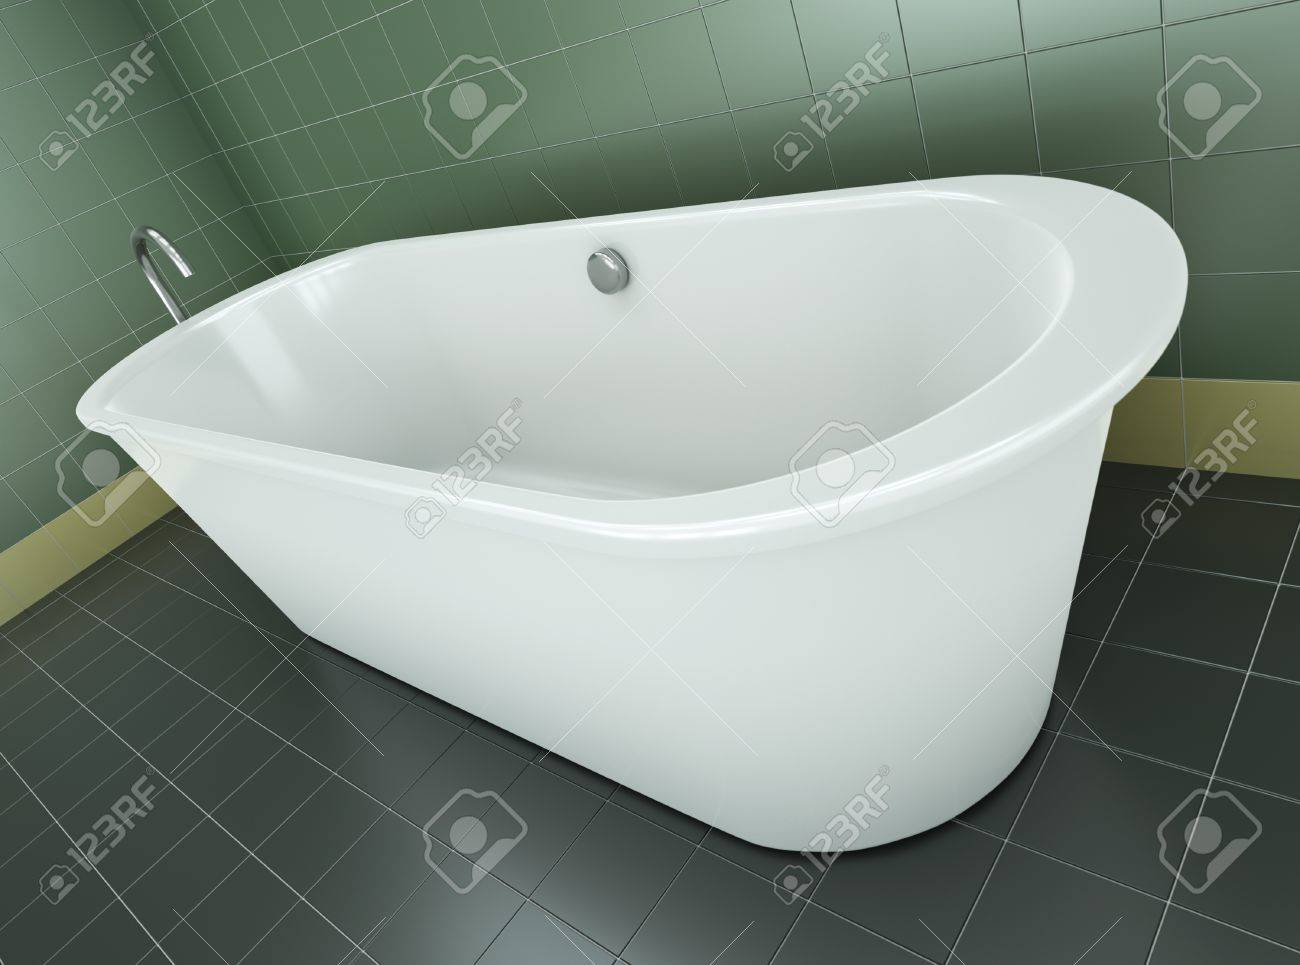 Classic Bathtub In A Green Tile Bathroom. 3D Render. Stock Photo   8980094